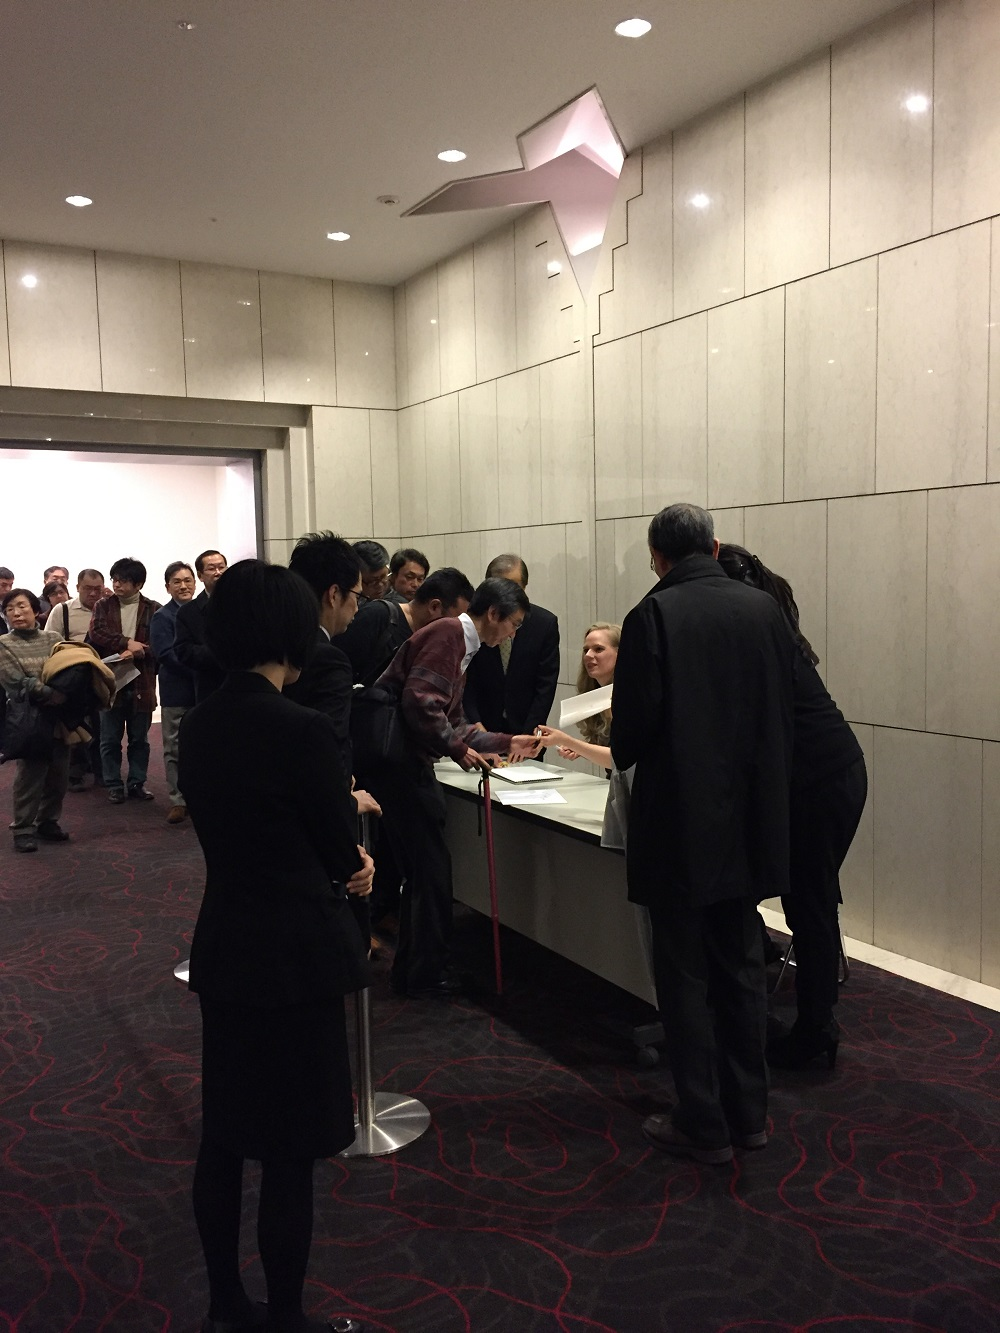 2017 - Japan, Tokyo Yomiuri Nippon Symphony Orchestra